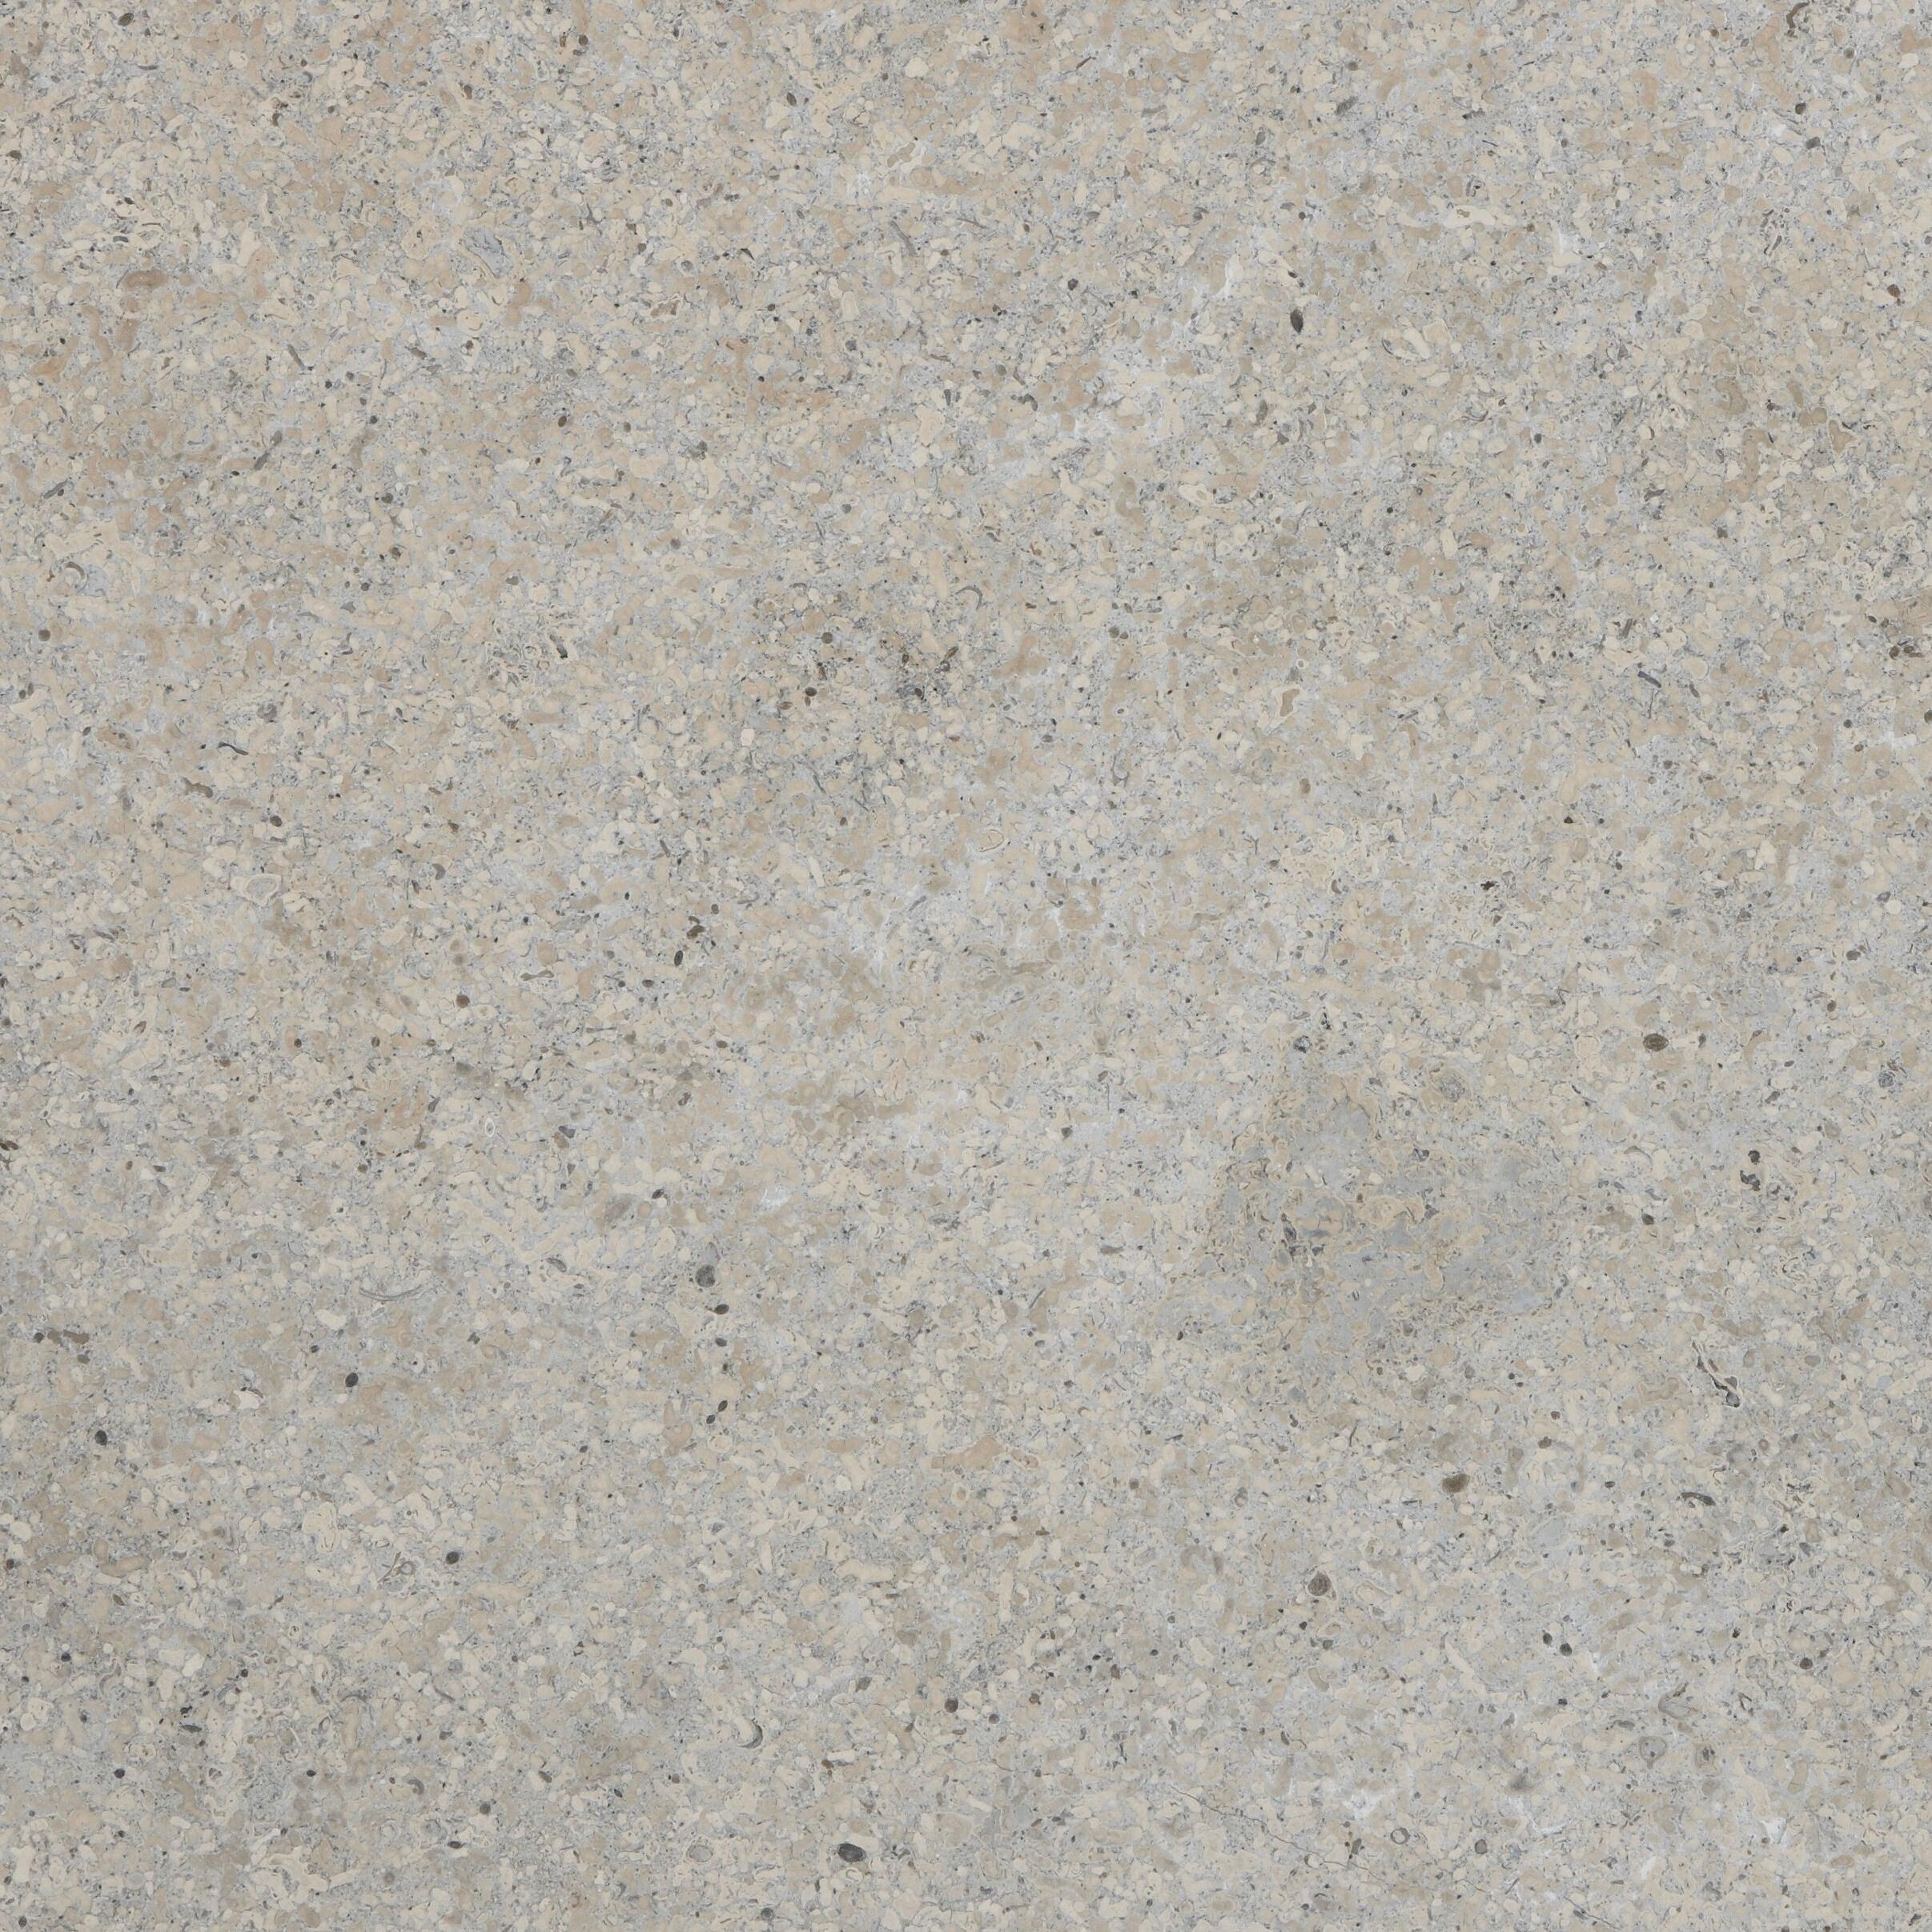 Free Photo Limestone Texture Closeup Gravestone Holes